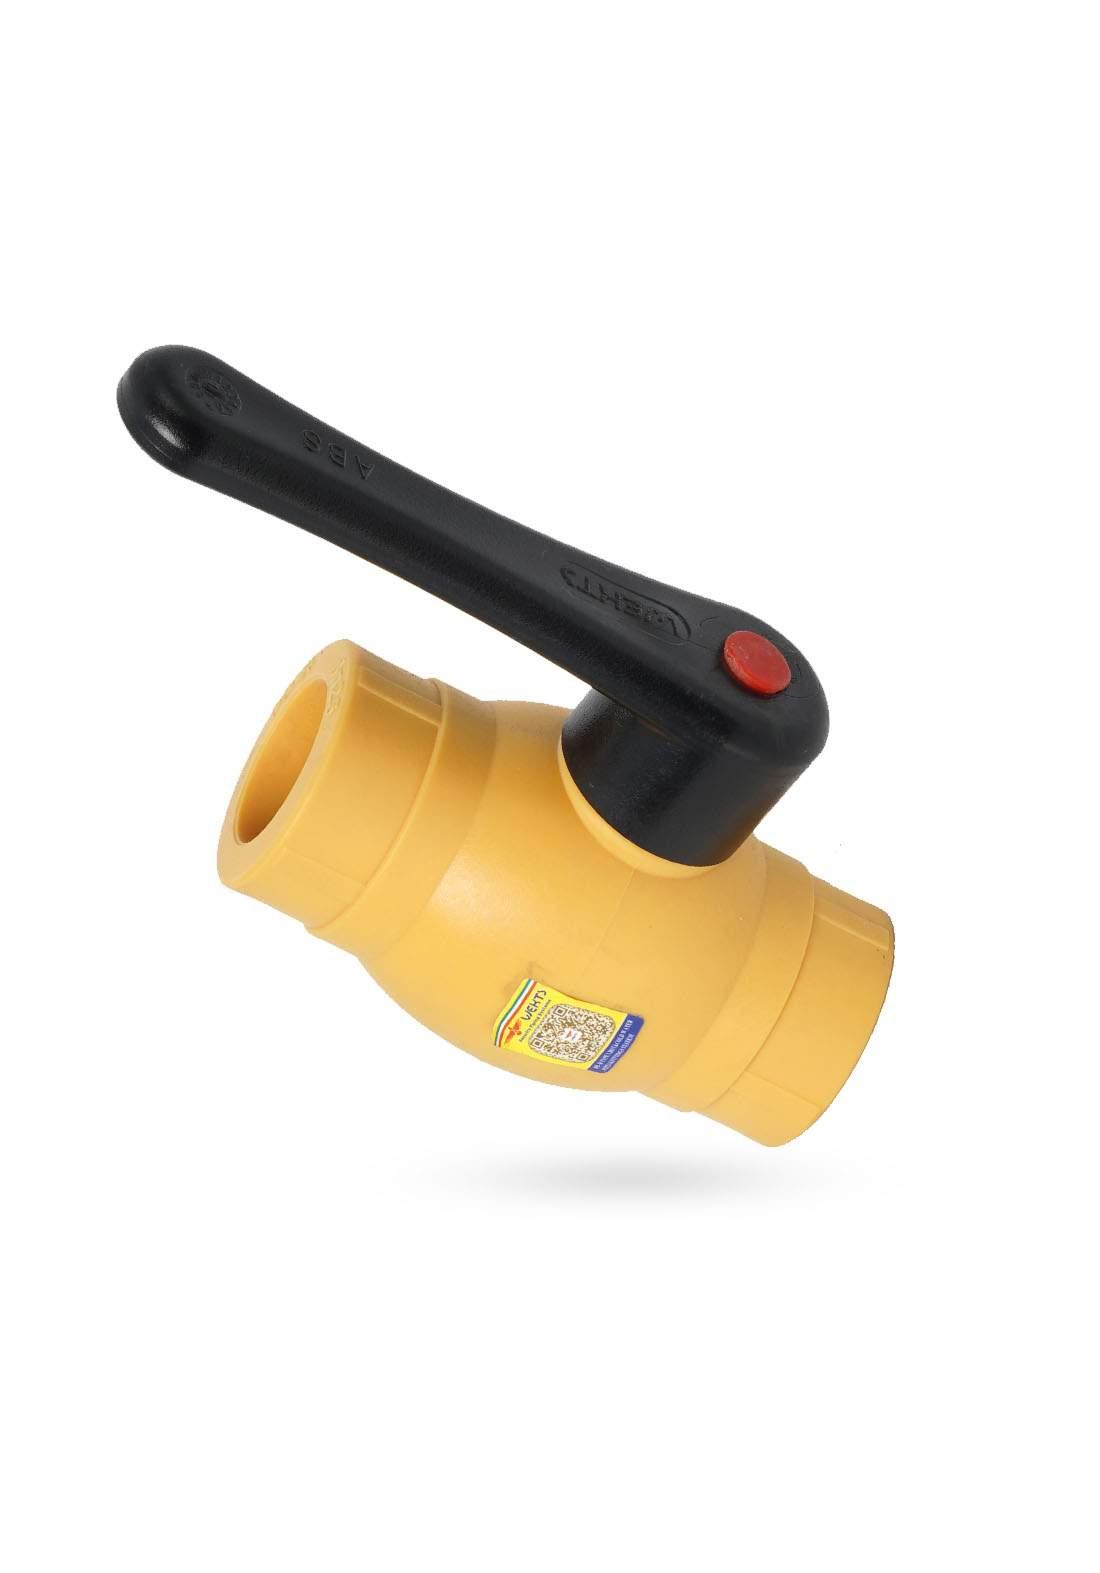 Wekts 5206 Water Pipe Lock 32 mm قفل  انابيب الماء